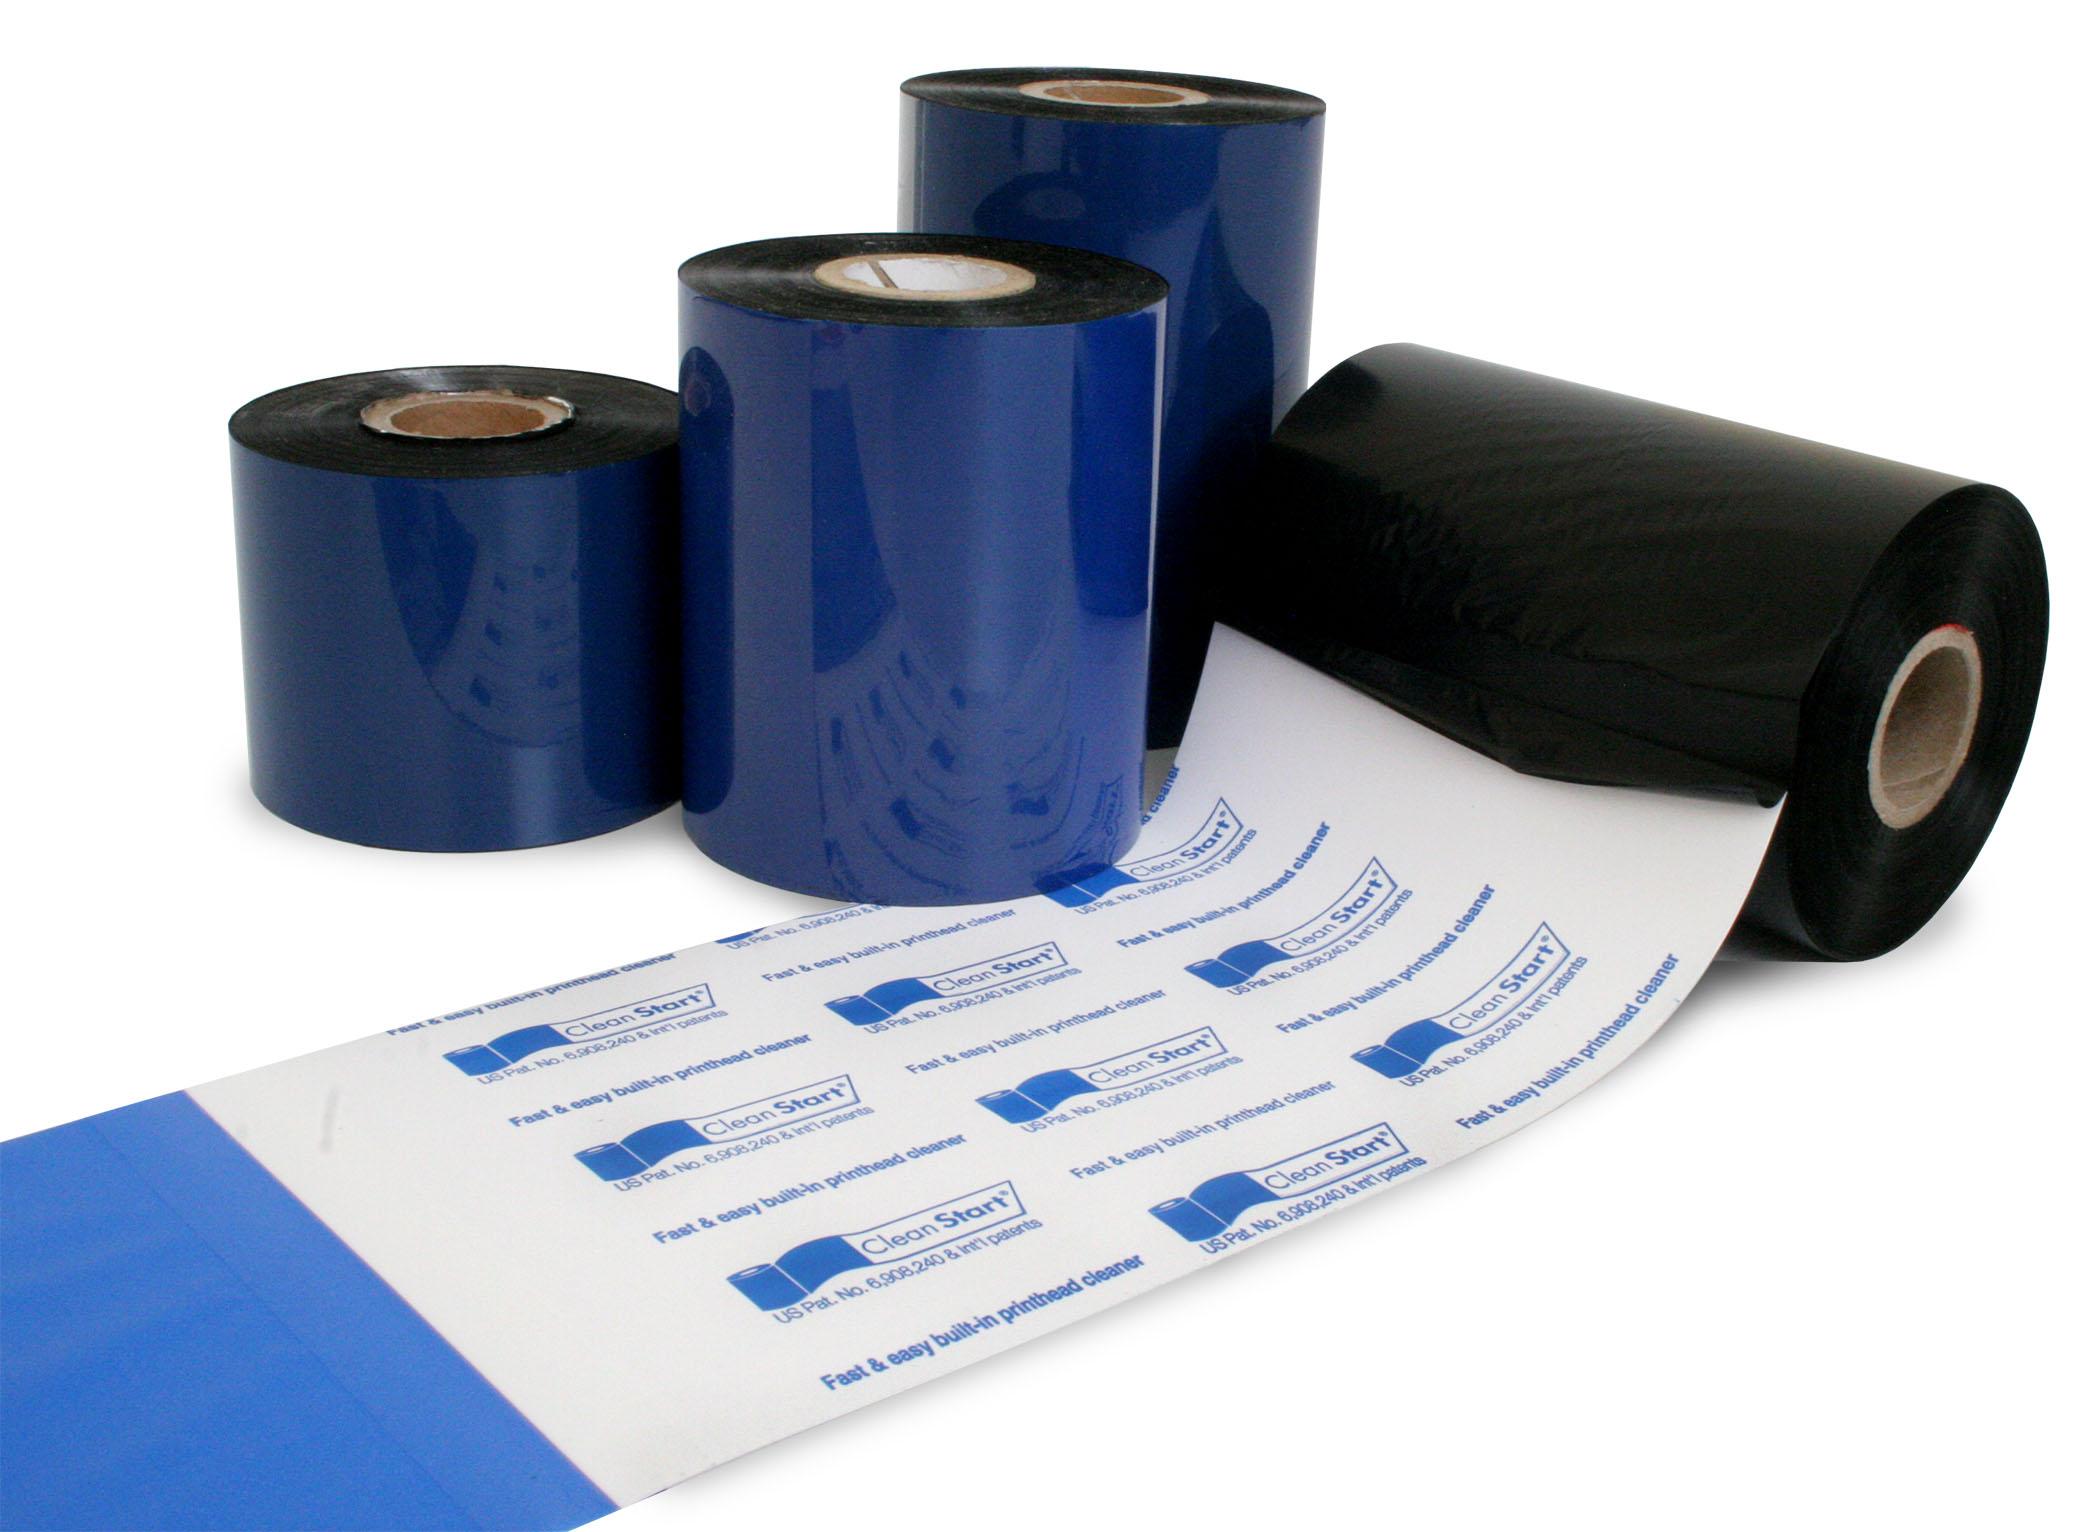 Go Mark 100 Economy Wax Thermal Transfer Printer Ribbons